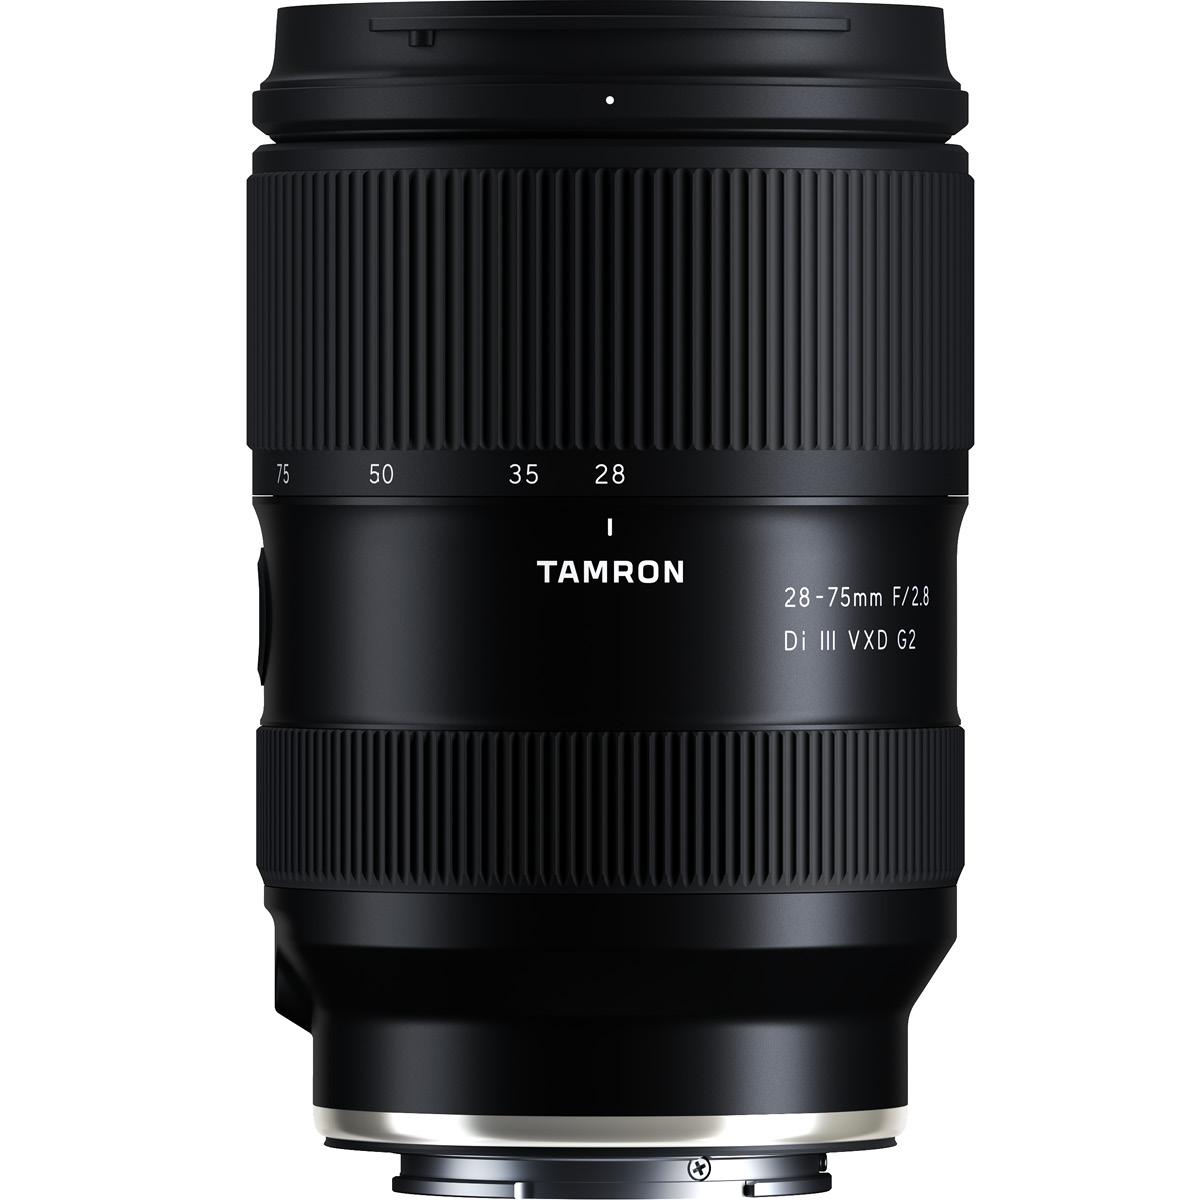 Tamron 28-75 mm 1:2,8 DI III VXD G2 für Sony FE-Mount